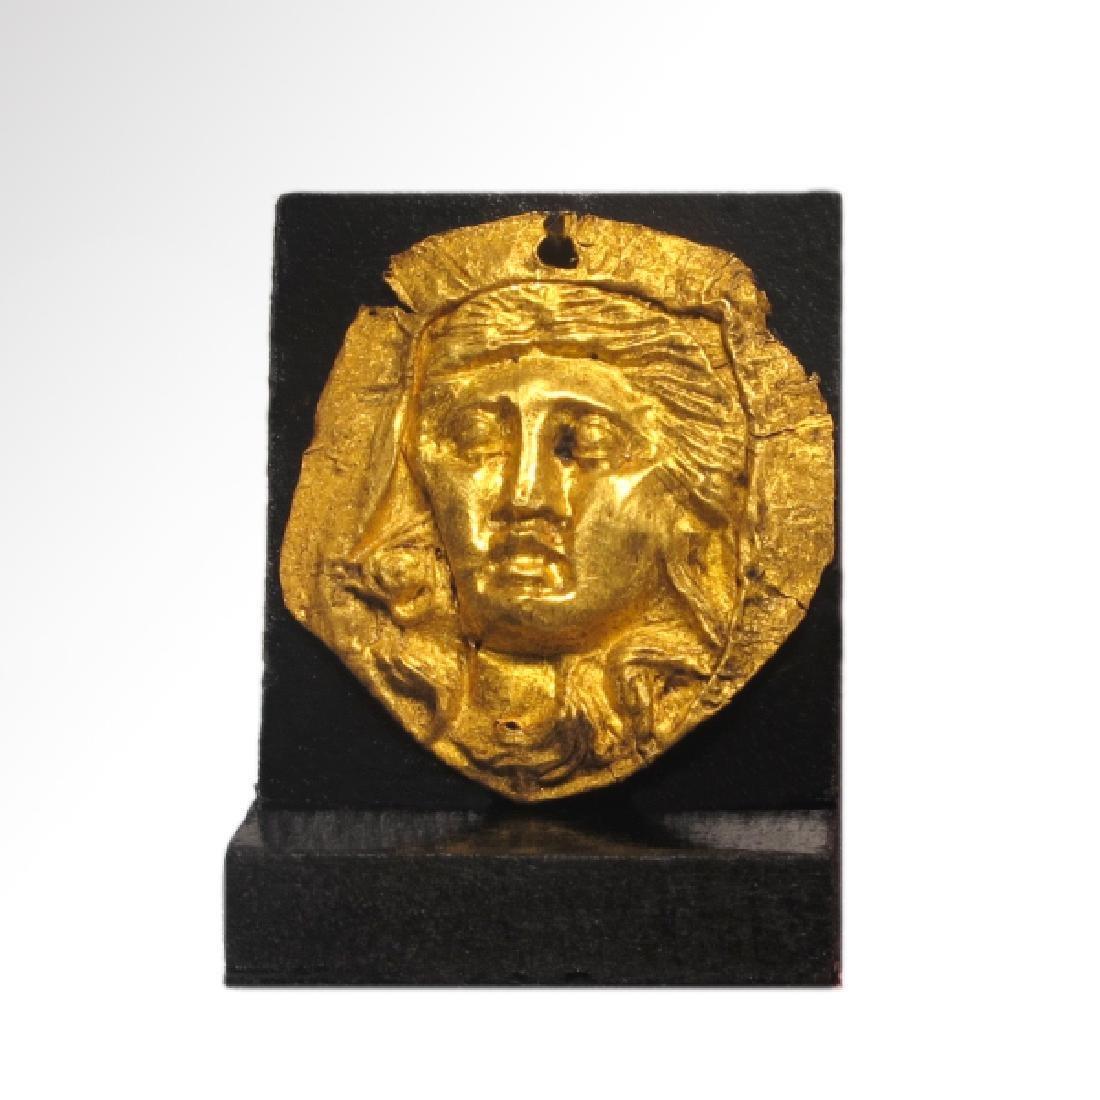 Roman Gold Inlay, Head of a Venus, c. 2nd Century AD